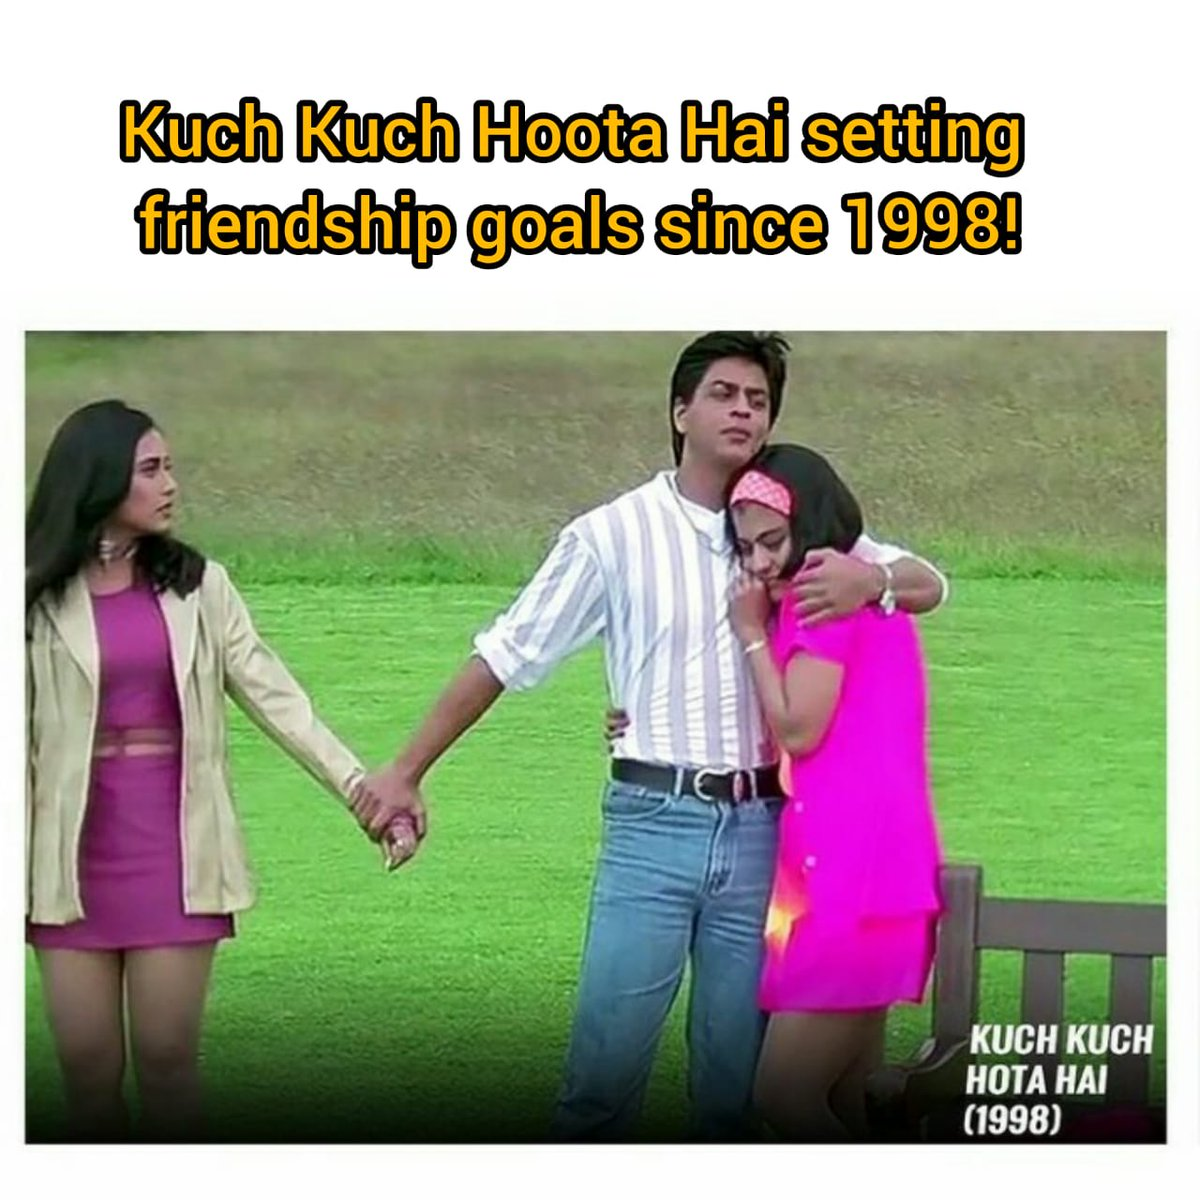 Kuch kuch hota hai since 1998!🤪 #KaranJohar #DharmaProductions #Bollywood #KuchKuchHotaHai #BestMovies #BollywoodMovies #Entertainment #BestFilmMaker #BestDirector #BestMovie #Director https://t.co/V2cJwiRpCC